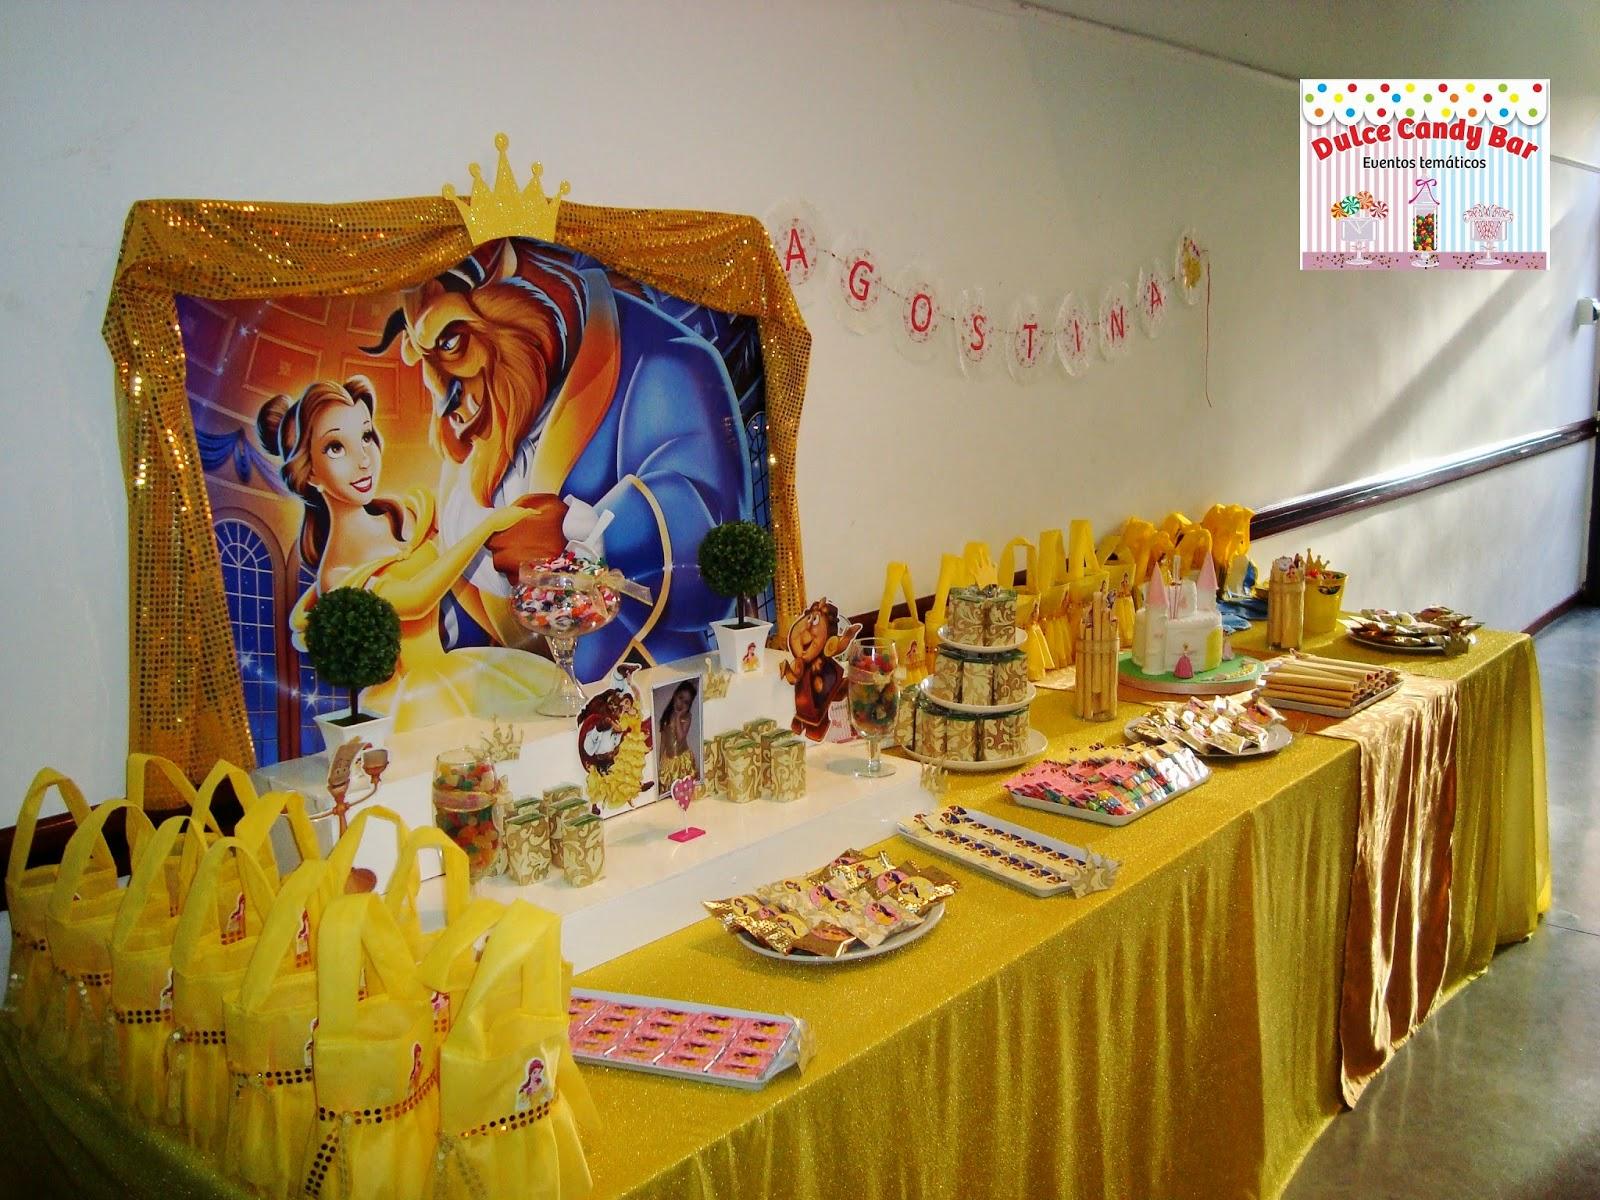 Dulce Candy Bar  Eventos Temticos Bella y Bestia para Agos